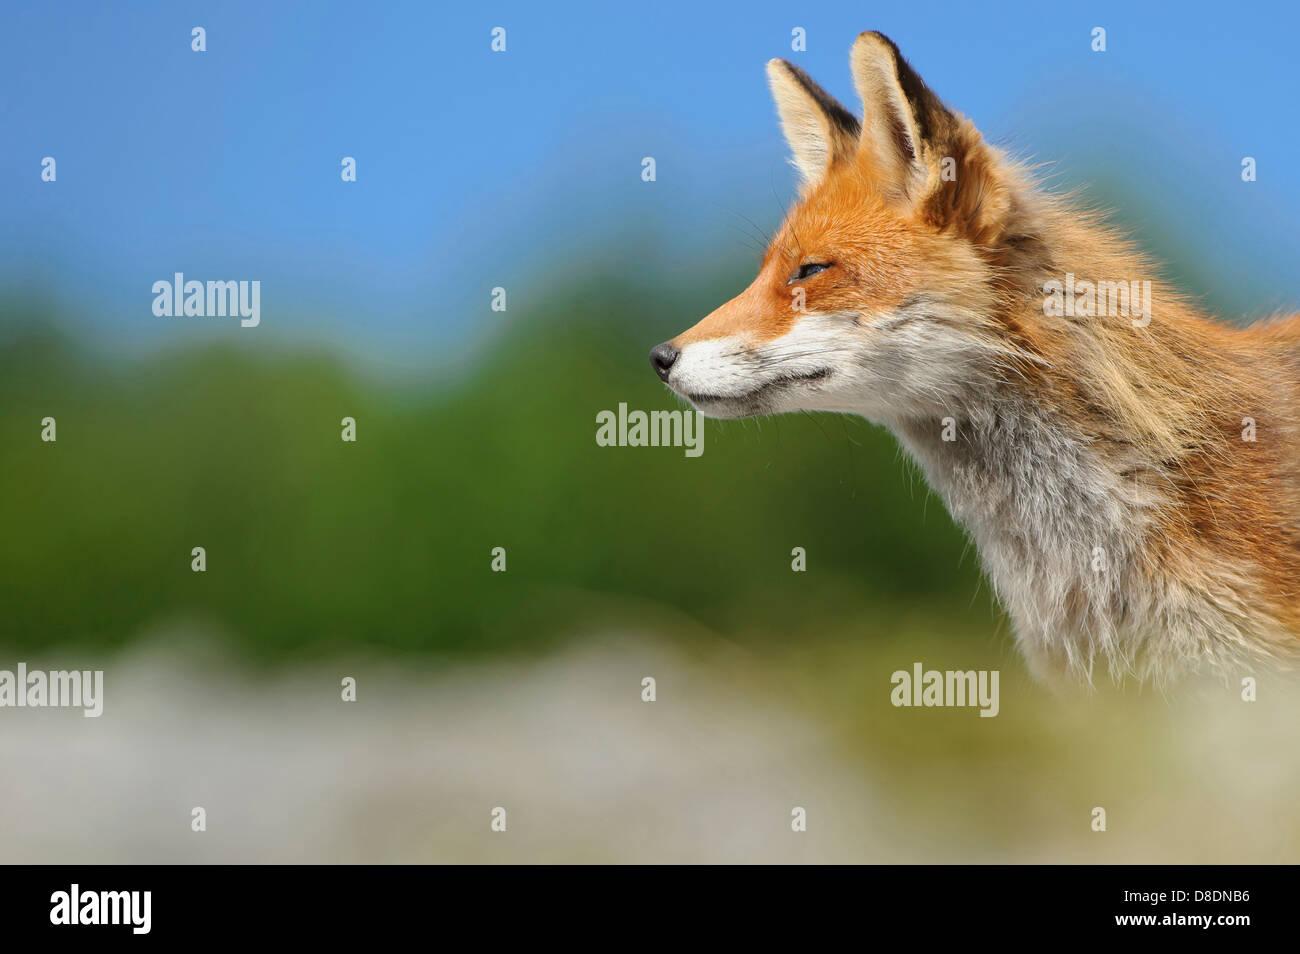 red fox, vulpes vulpes, lauvsnes, norway - Stock Image